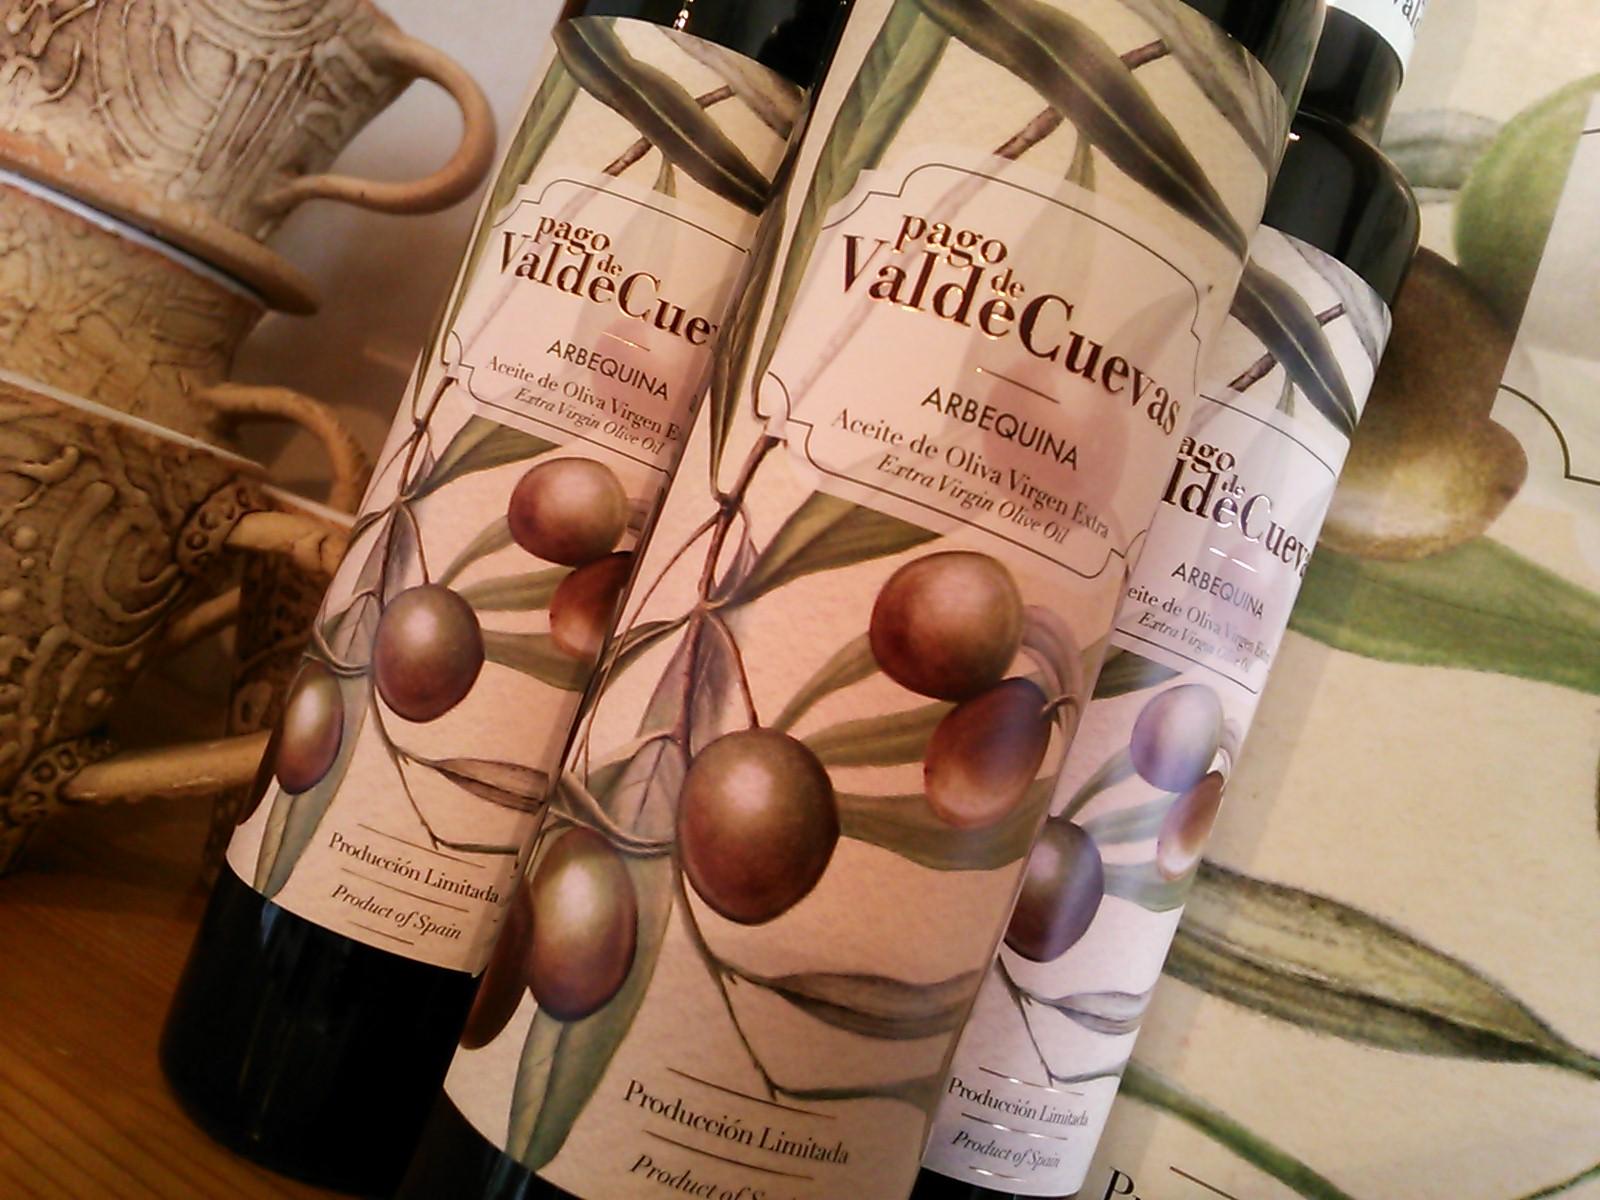 Pago de Valdecuevas Extra Virgin Olive Oil 500ml  (パゴ・デ・バルデクエバス エクストラヴァージンオリーブオイル)